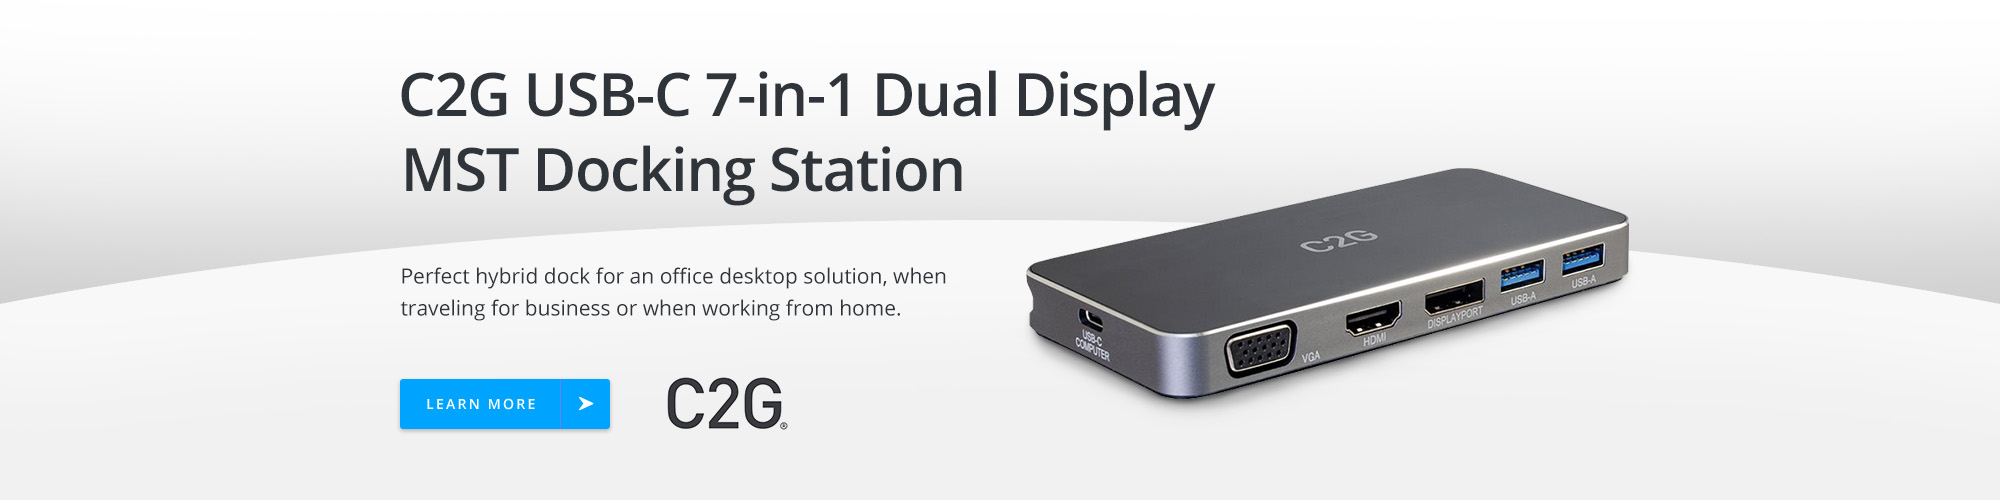 C2G USB-C 7-in-1 Dual Display MST Docking Station